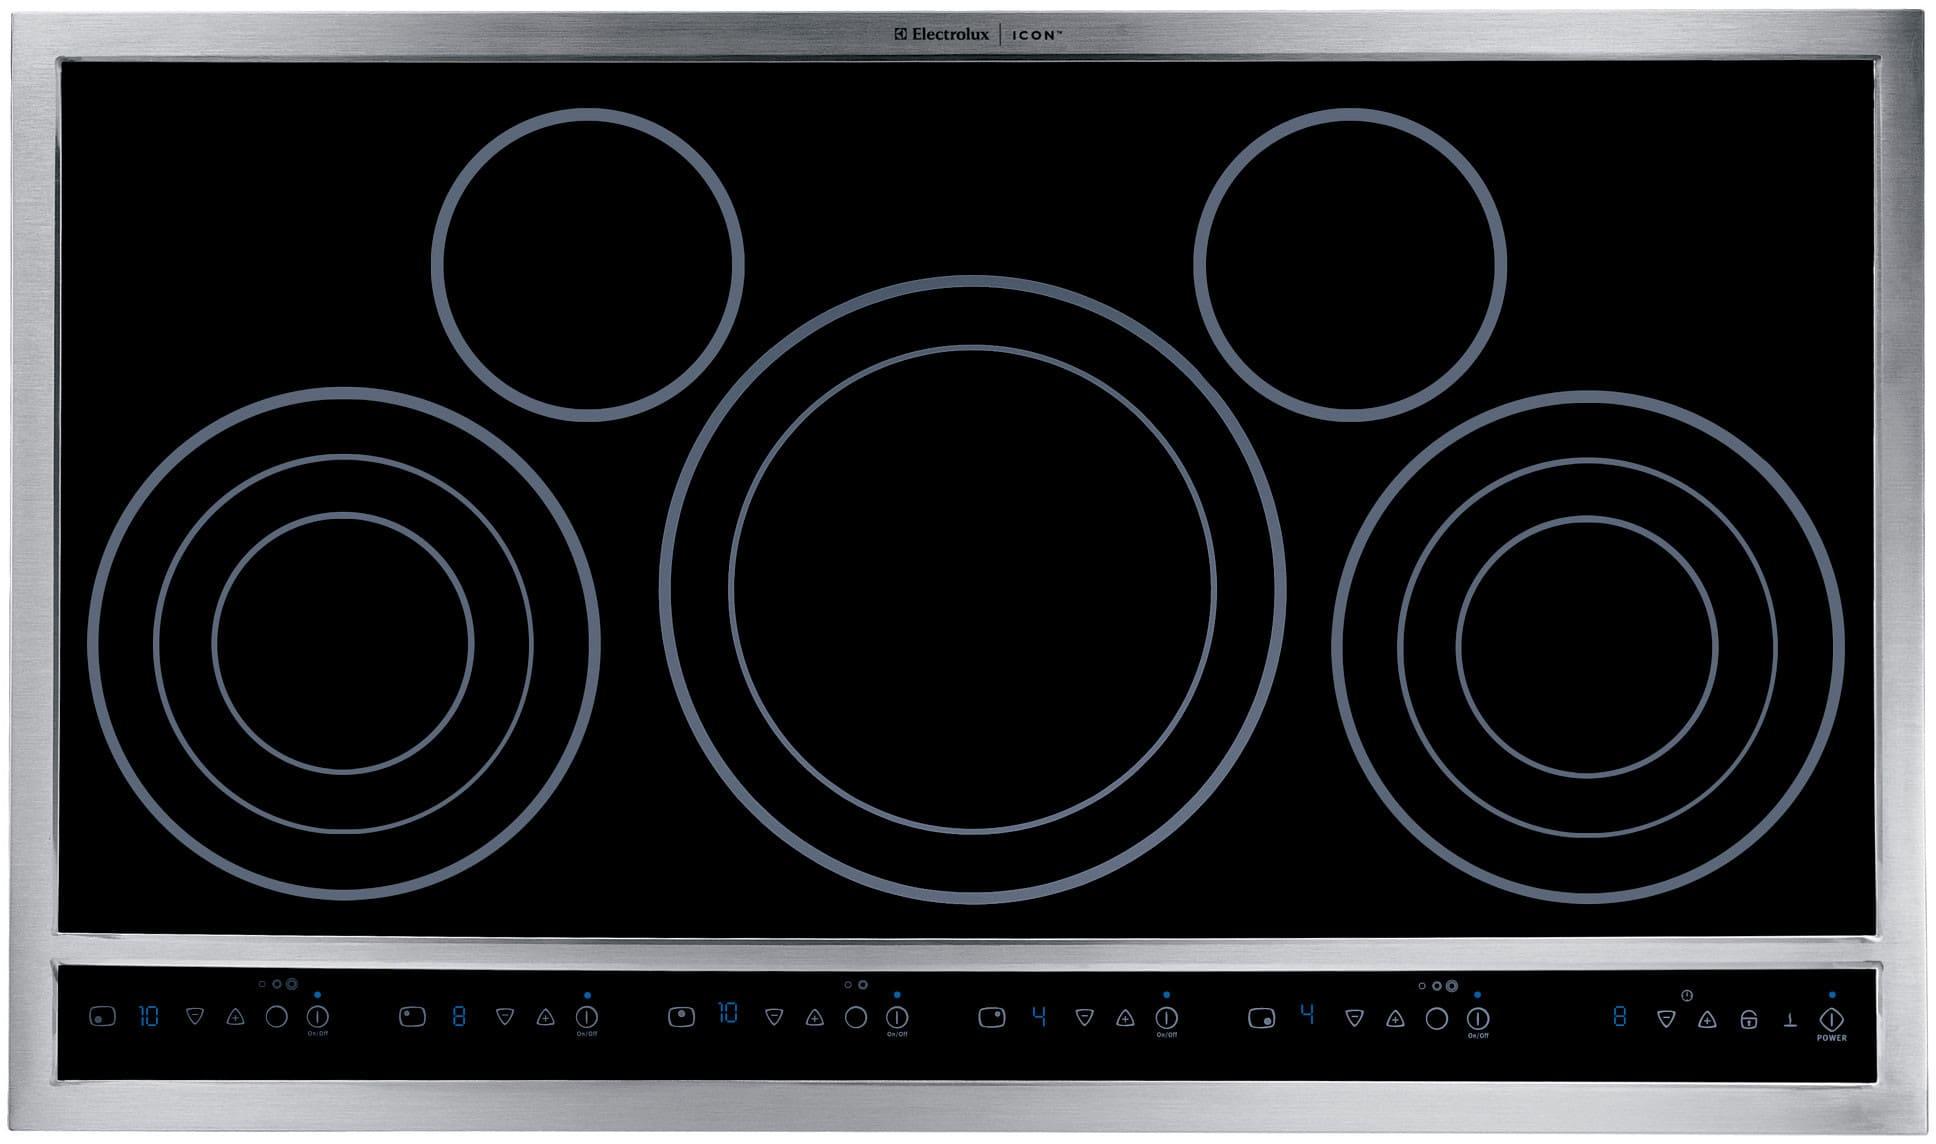 Electrolux E36ec70fss 36 Inch Drop In Electric Cooktop